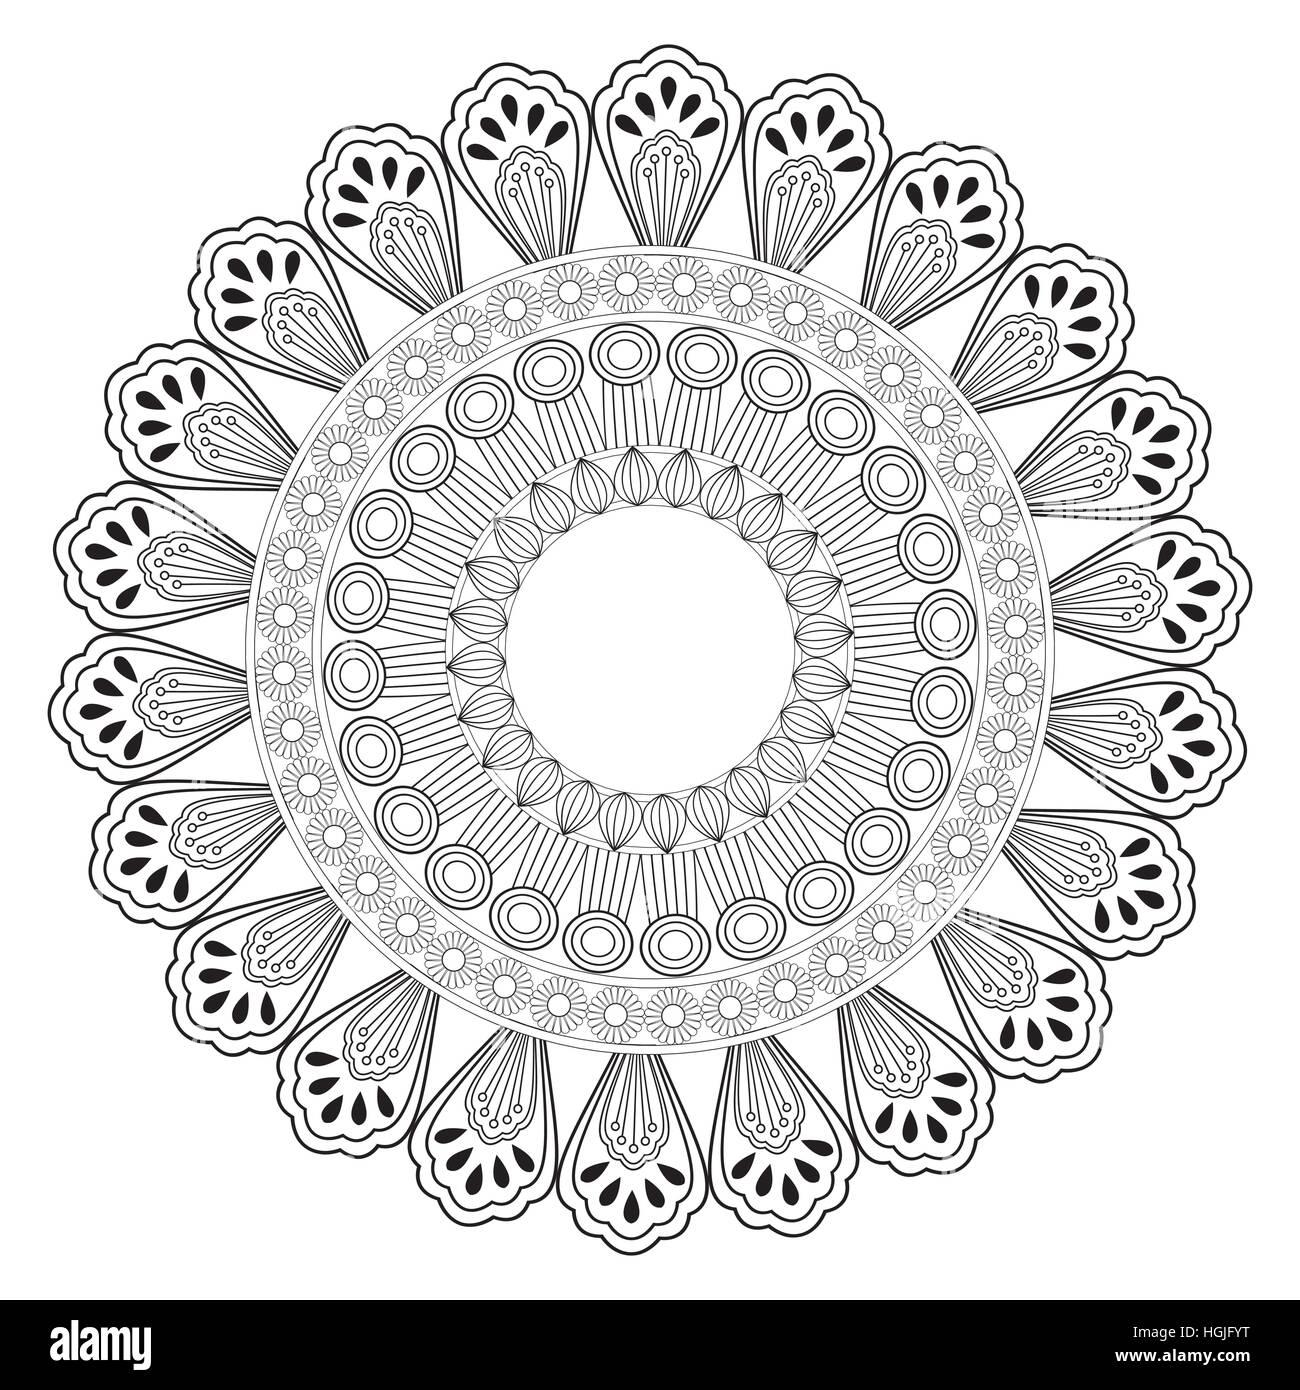 Intricate Mandala Stock Photos & Intricate Mandala Stock Images - Alamy